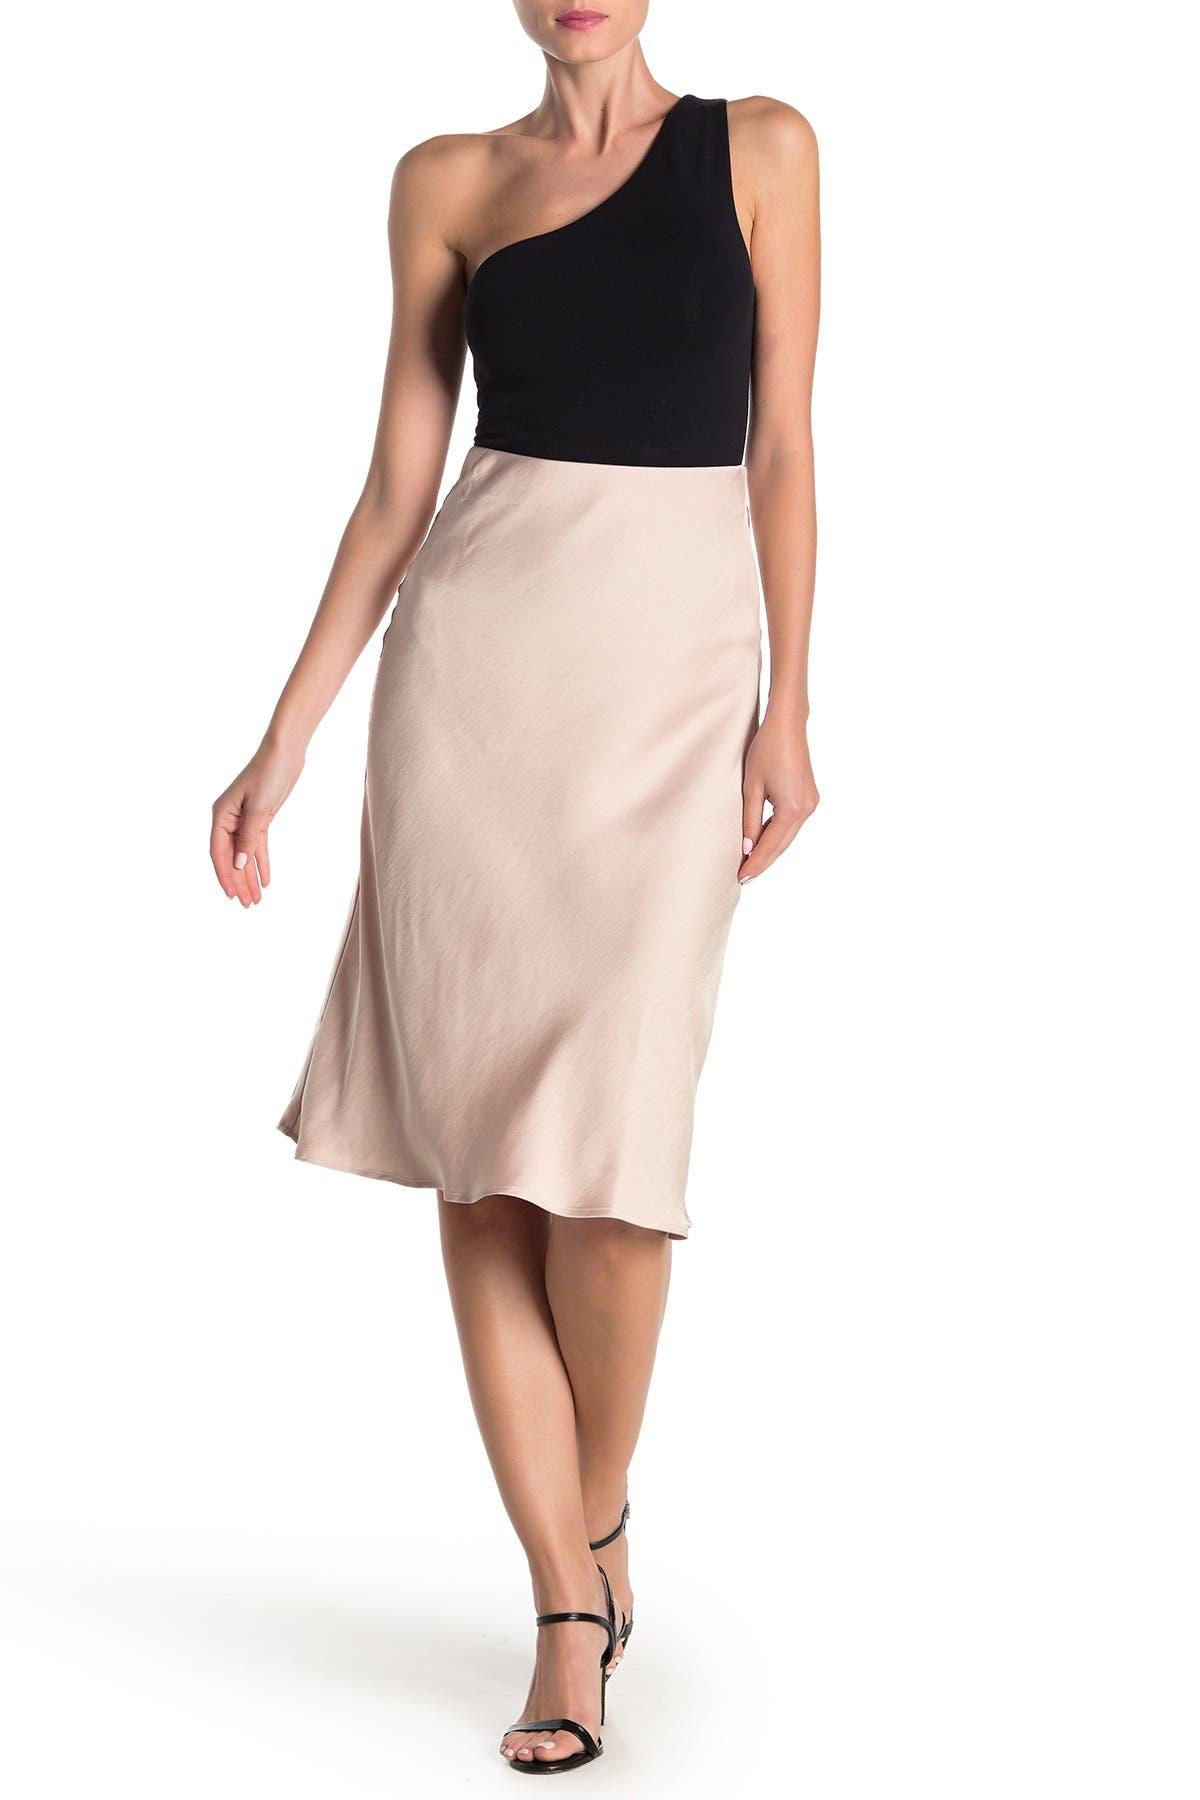 Image of CODEXMODE Satin Bias Cut Midi Skirt